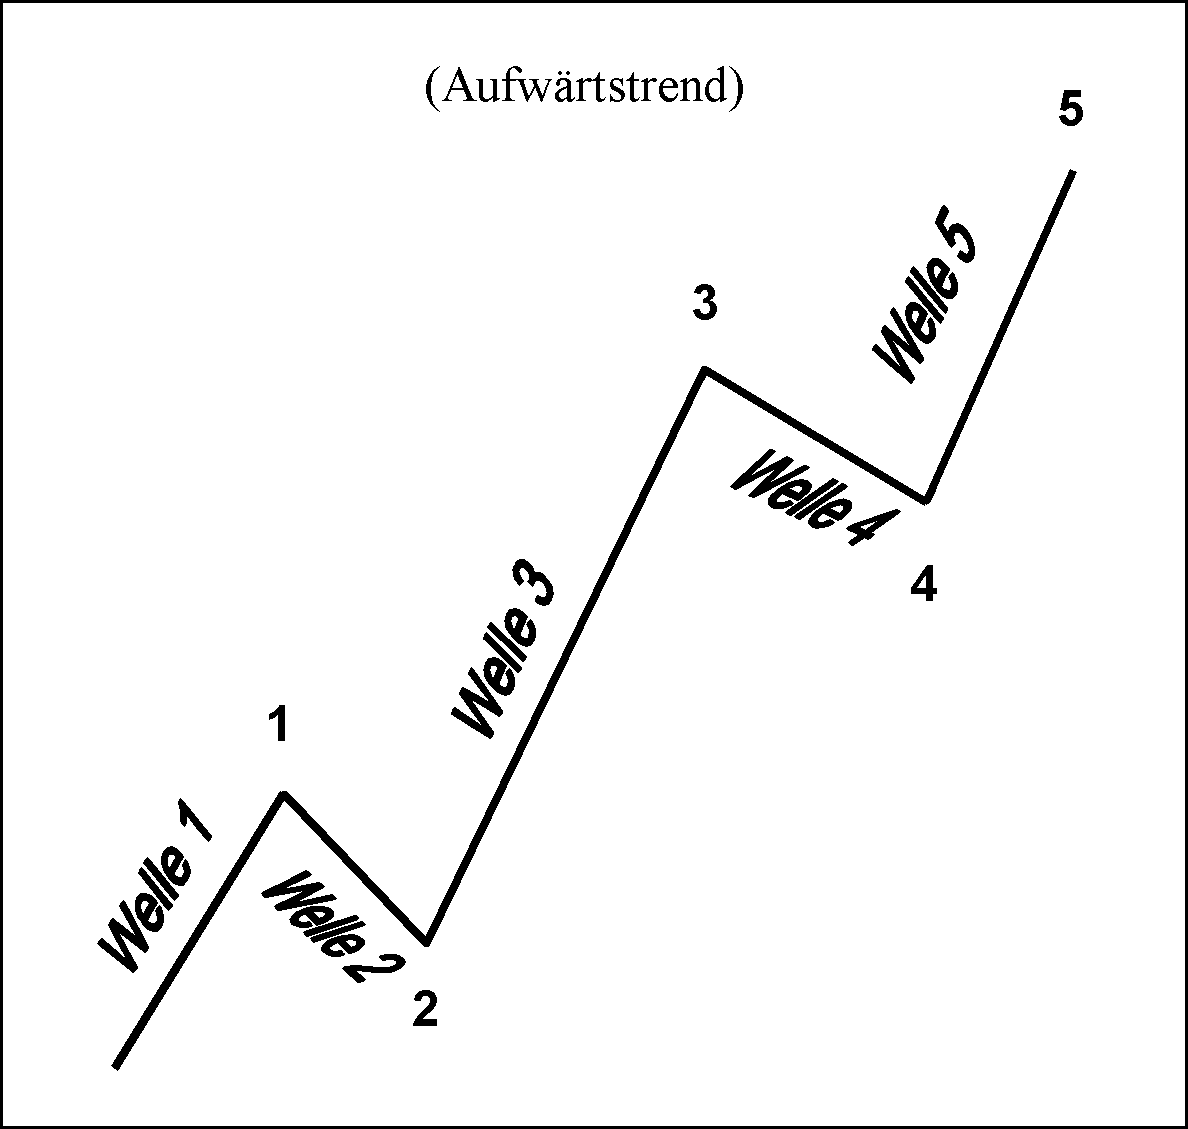 Impulsives-DAX-Trading-mit-Hilfe-der-Elliott-Wellen-Theorie-André-Tiedje-GodmodeTrader.de-1